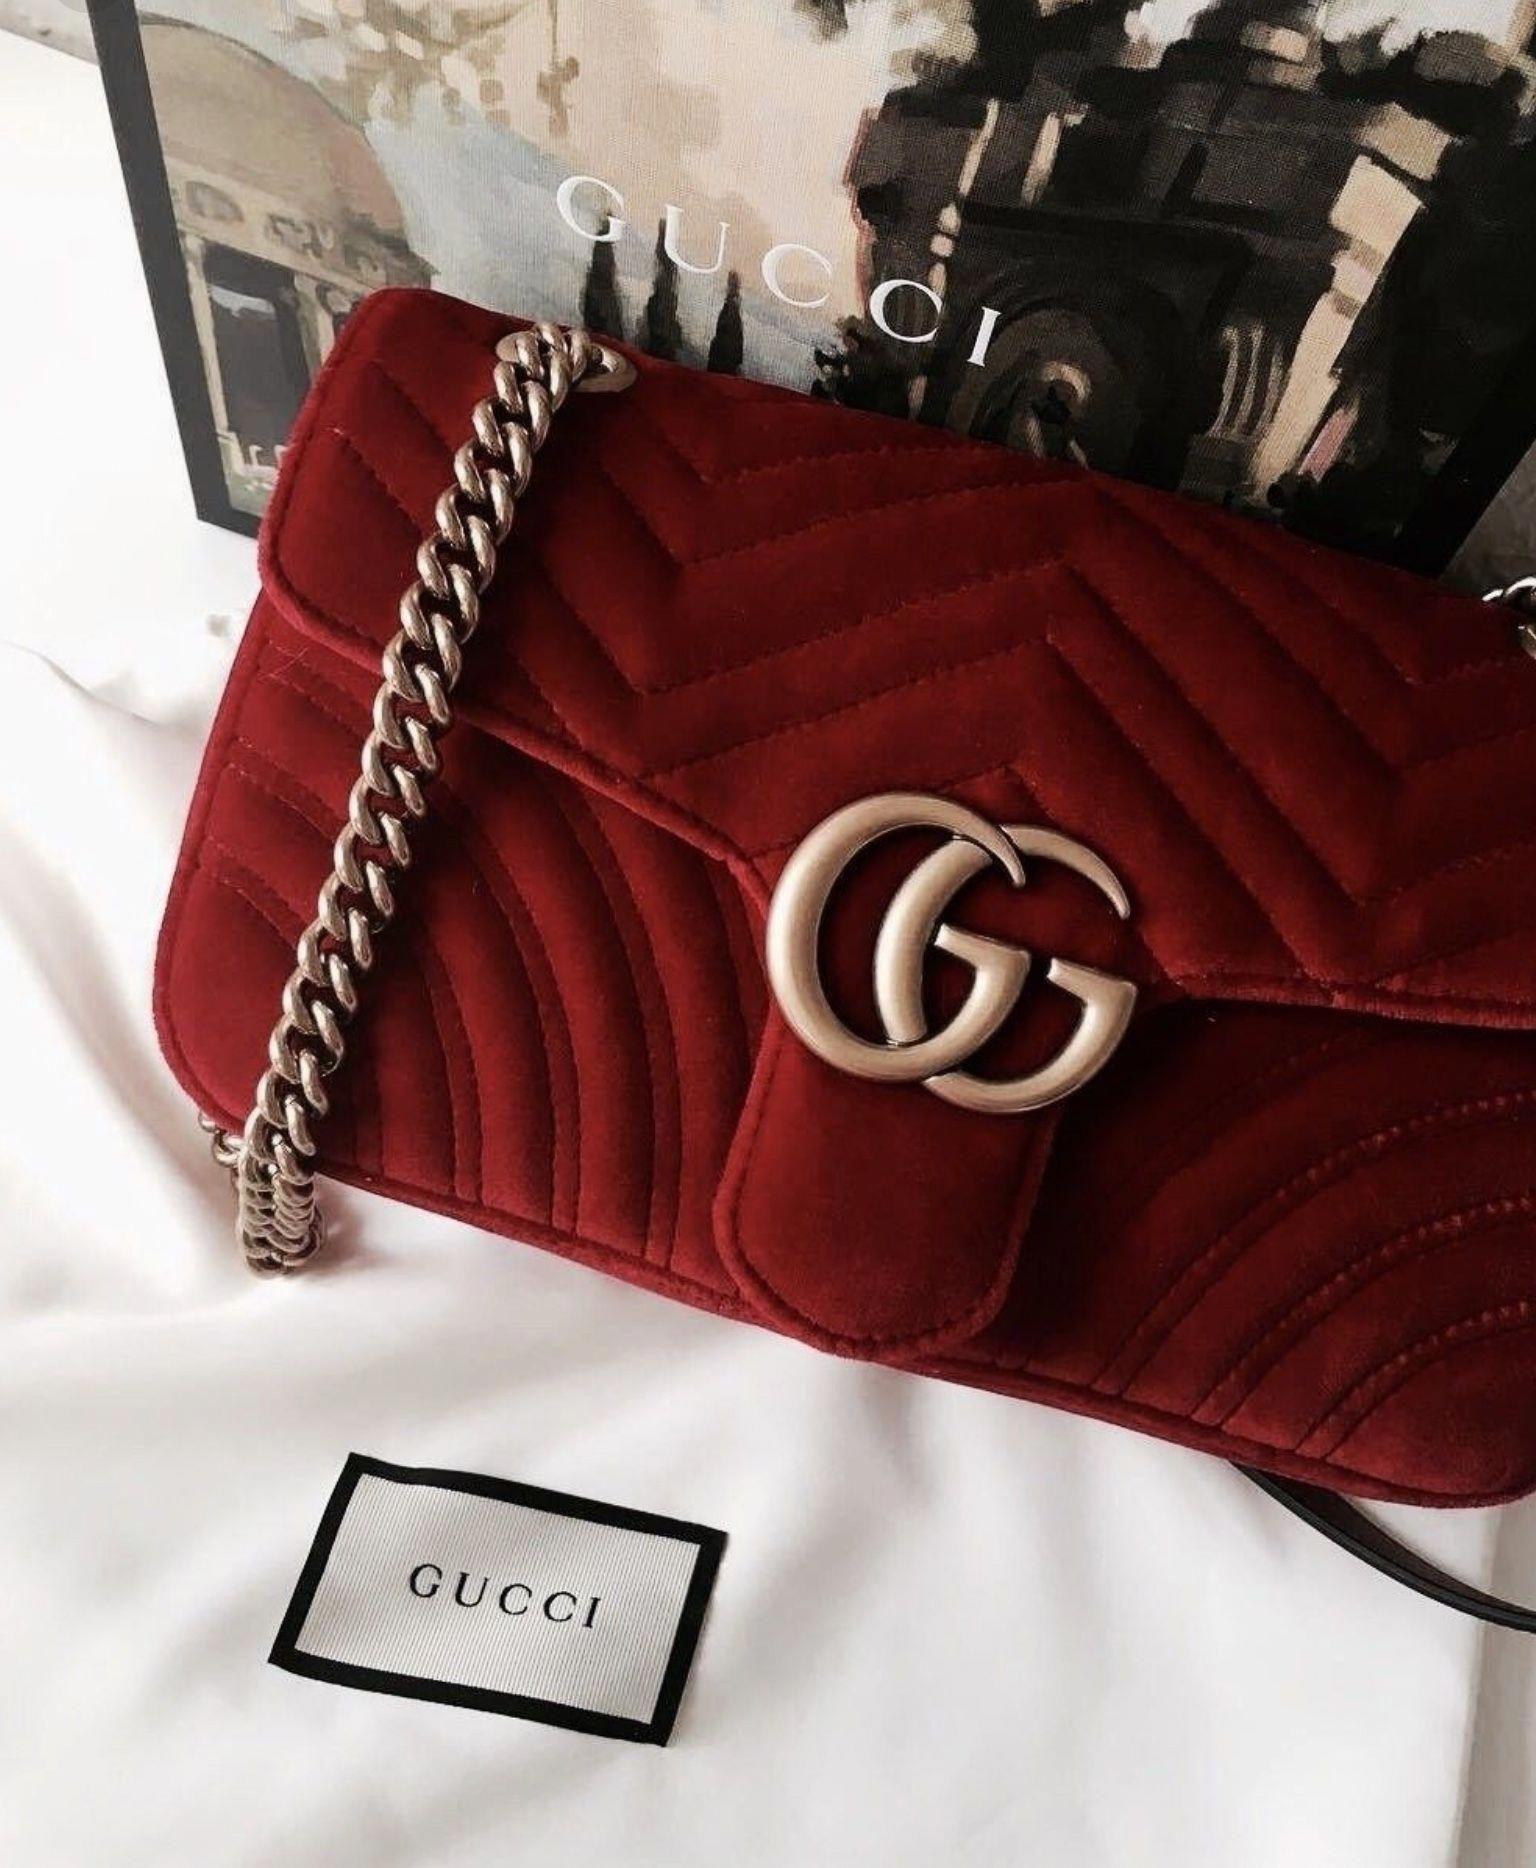 Gucci Bag Fashion Handbag Expensive Guccibag Expensivehandbags Handbagsgucci Guccibags Bags Designer Bags Luxury Bags